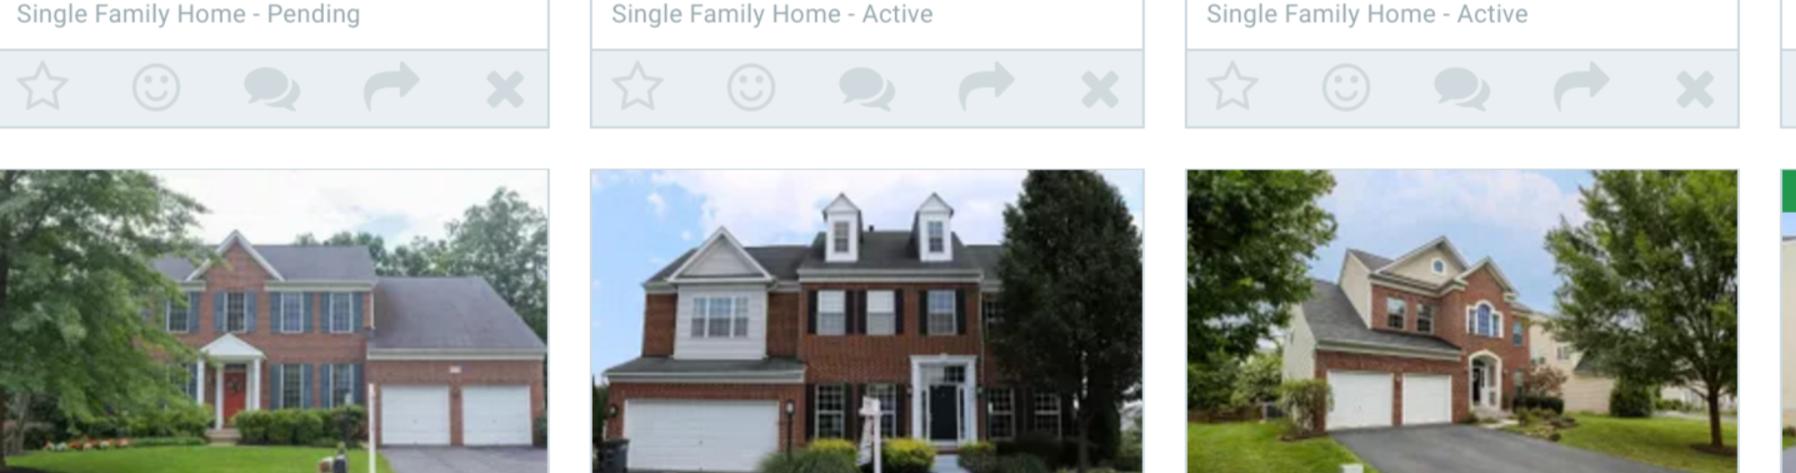 New Single Family Homes For Sale In Fairfax Va